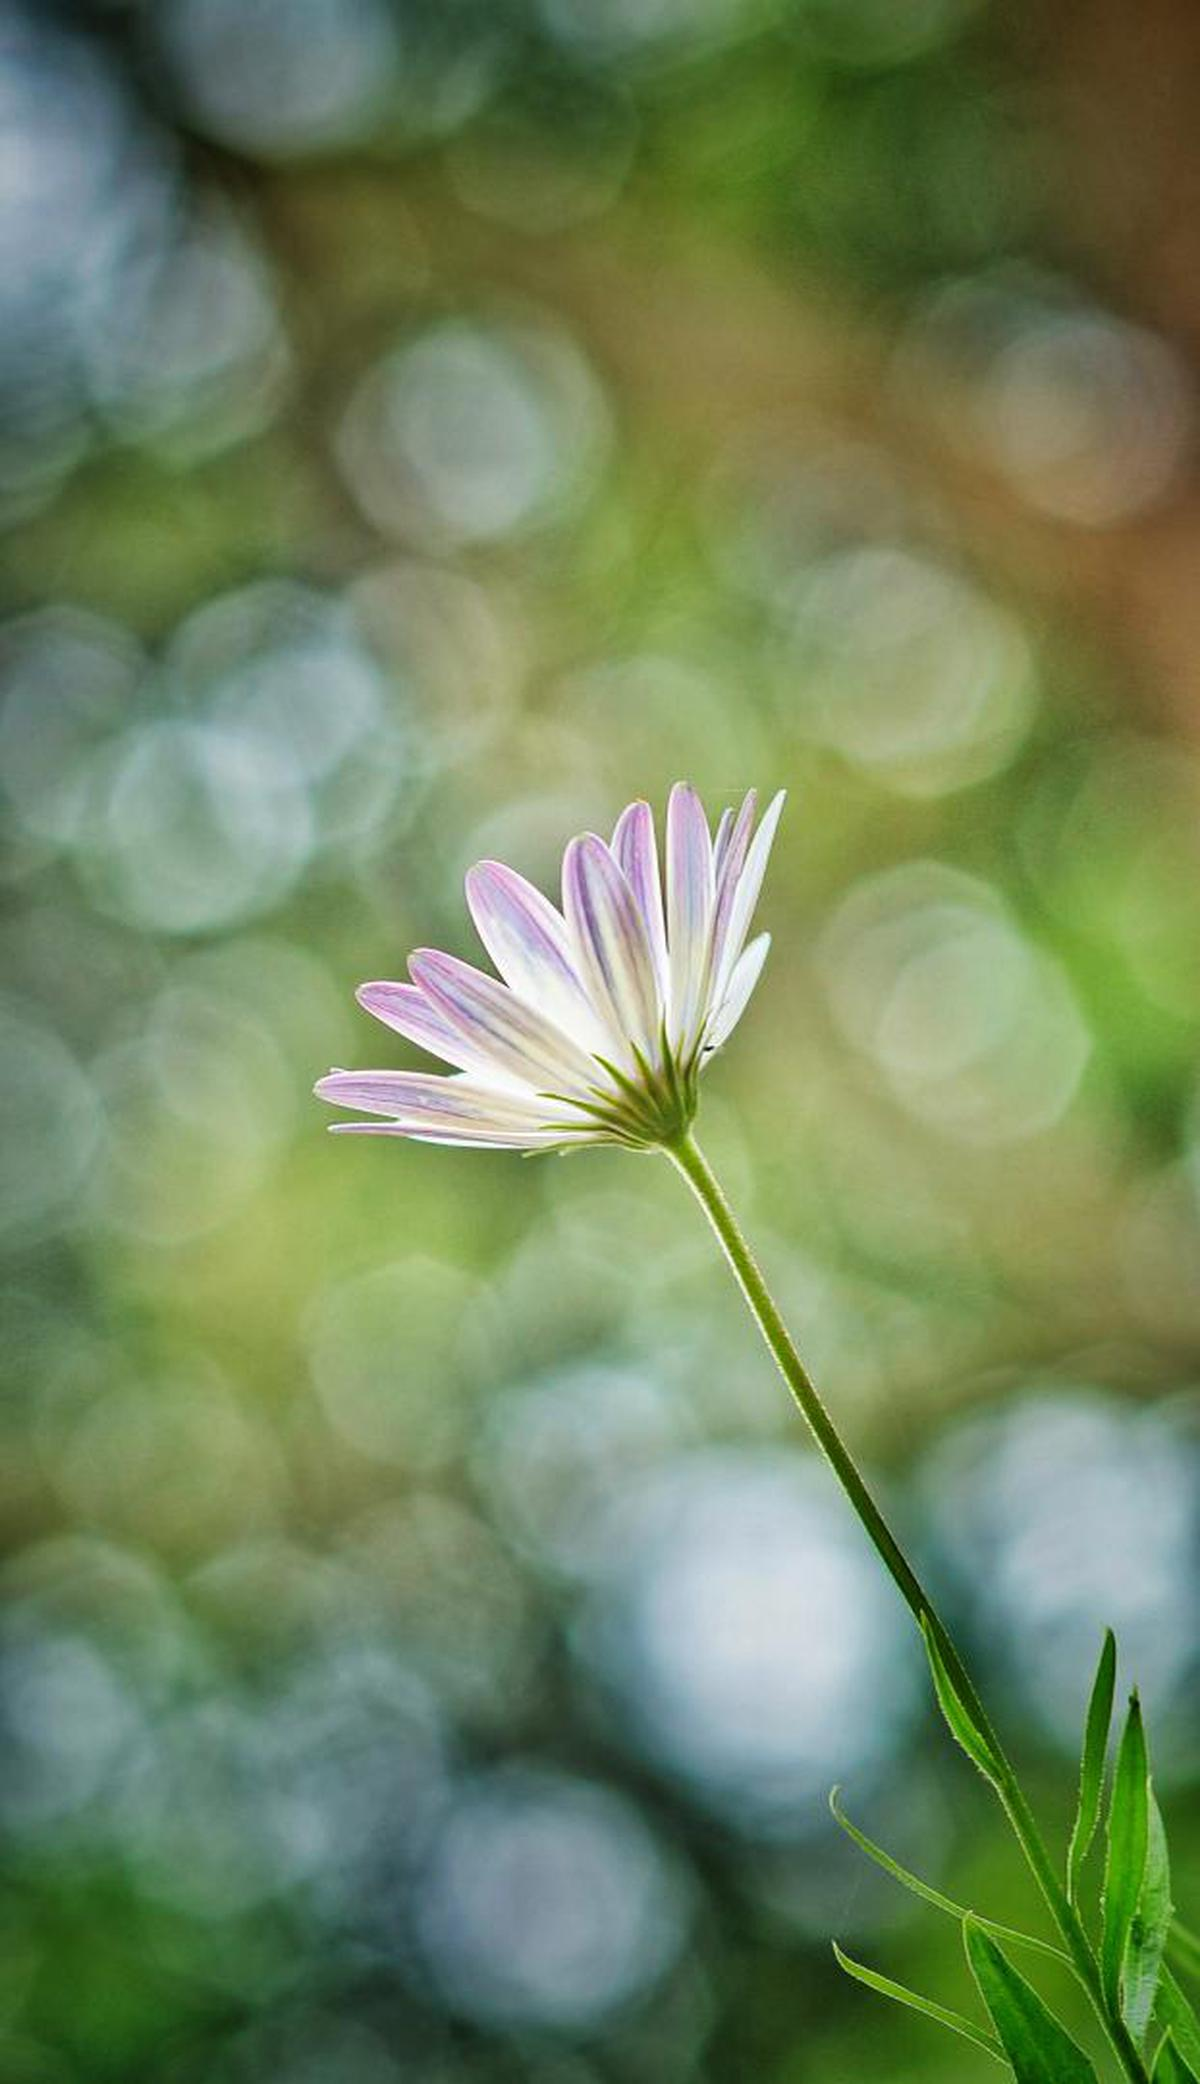 Image of Flower, Flowering plant, Green, Plant, Petal, Close-up etc.